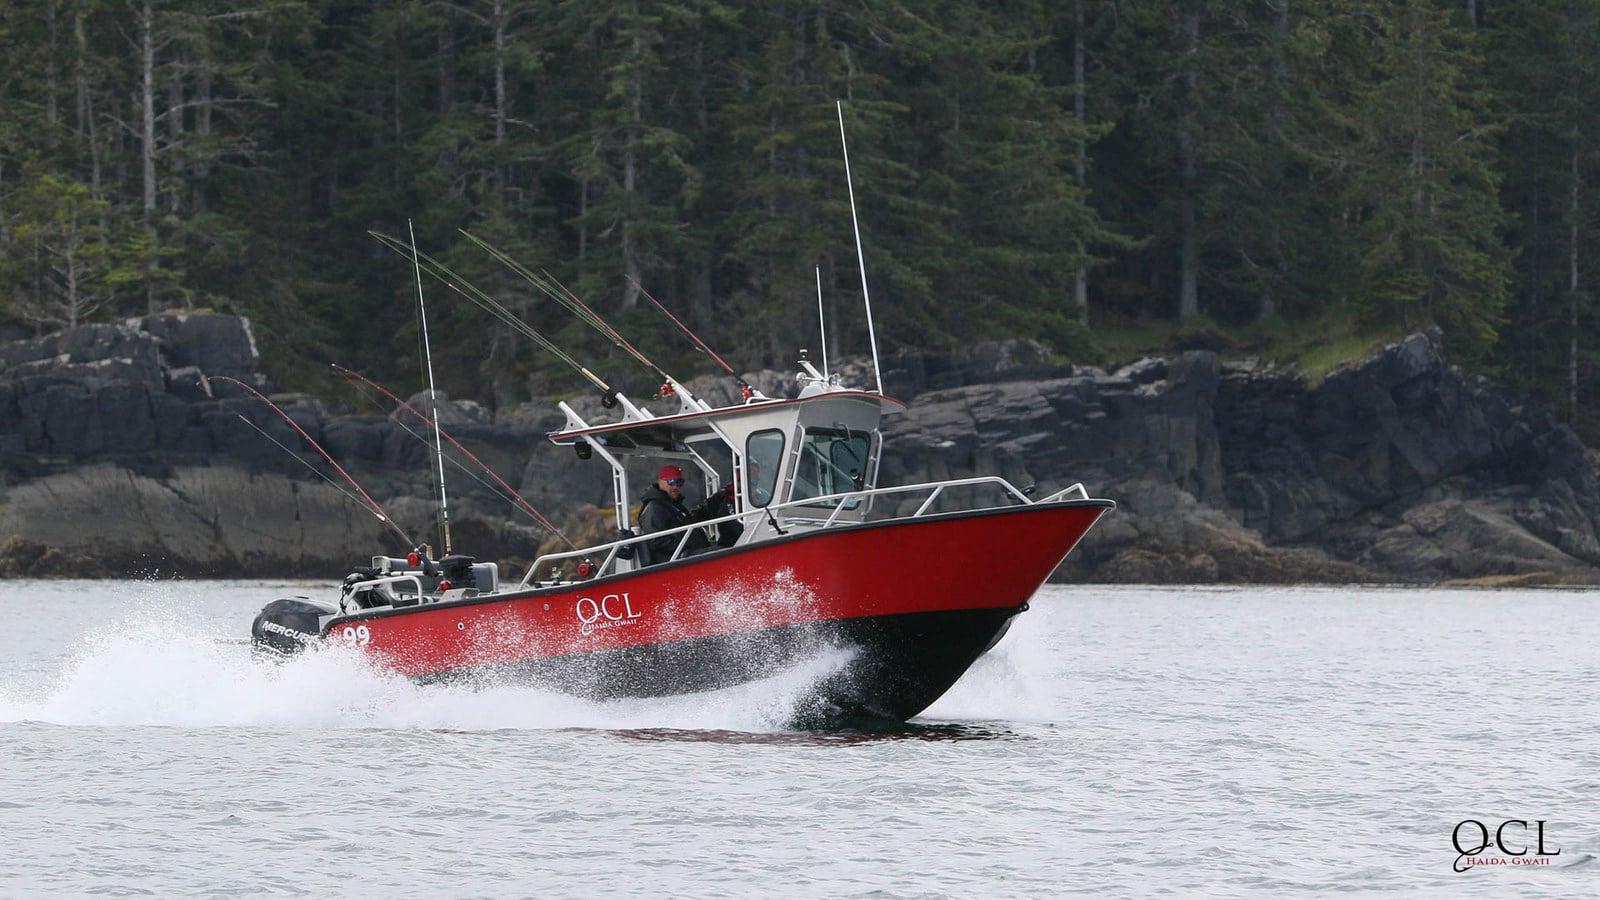 QCL Fishing Boat